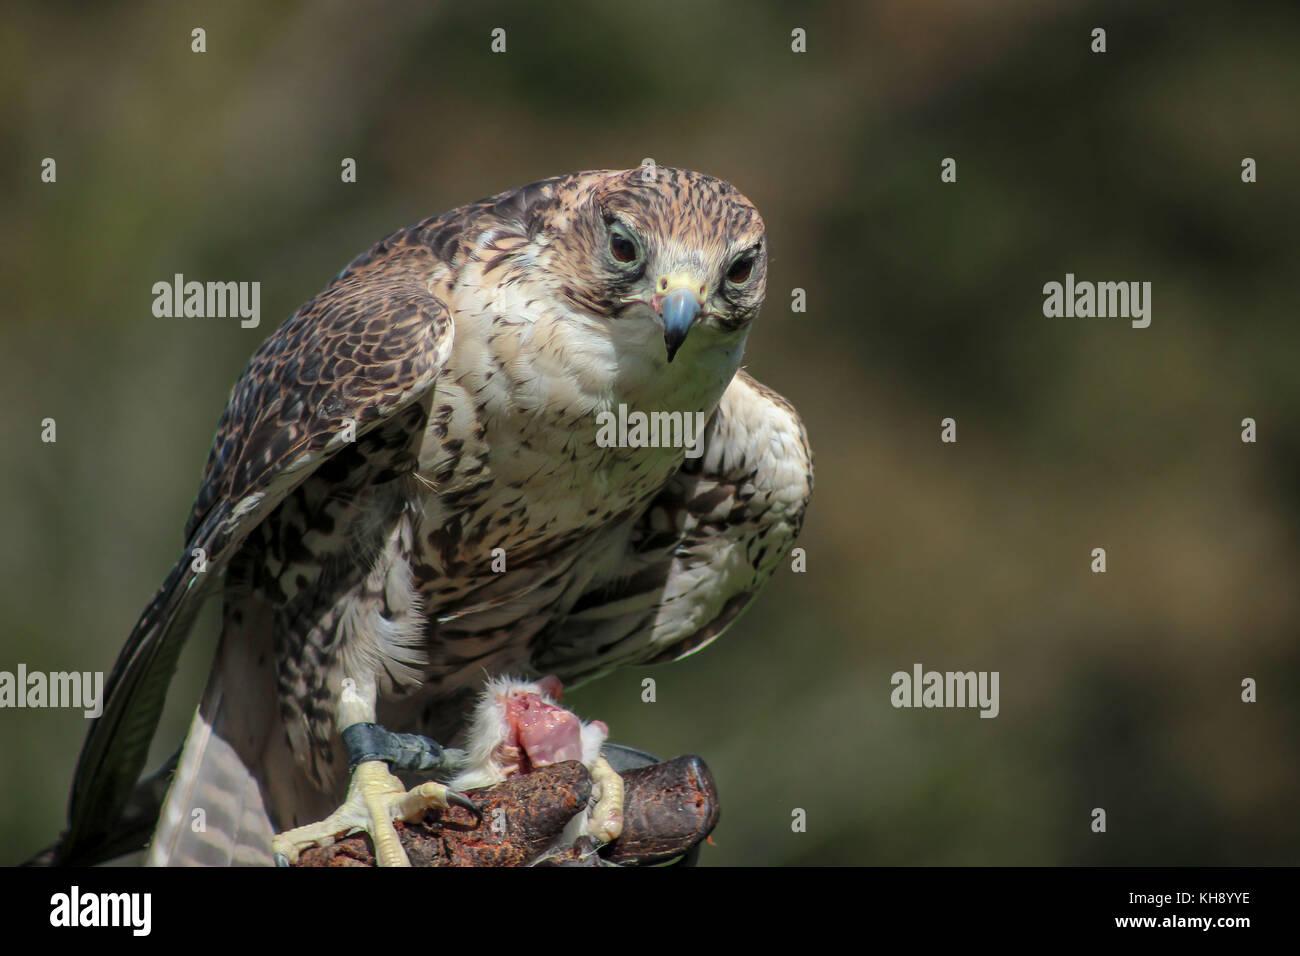 Falcon - Falco, Falknerei, Vorarlberg, Österreich Stockbild